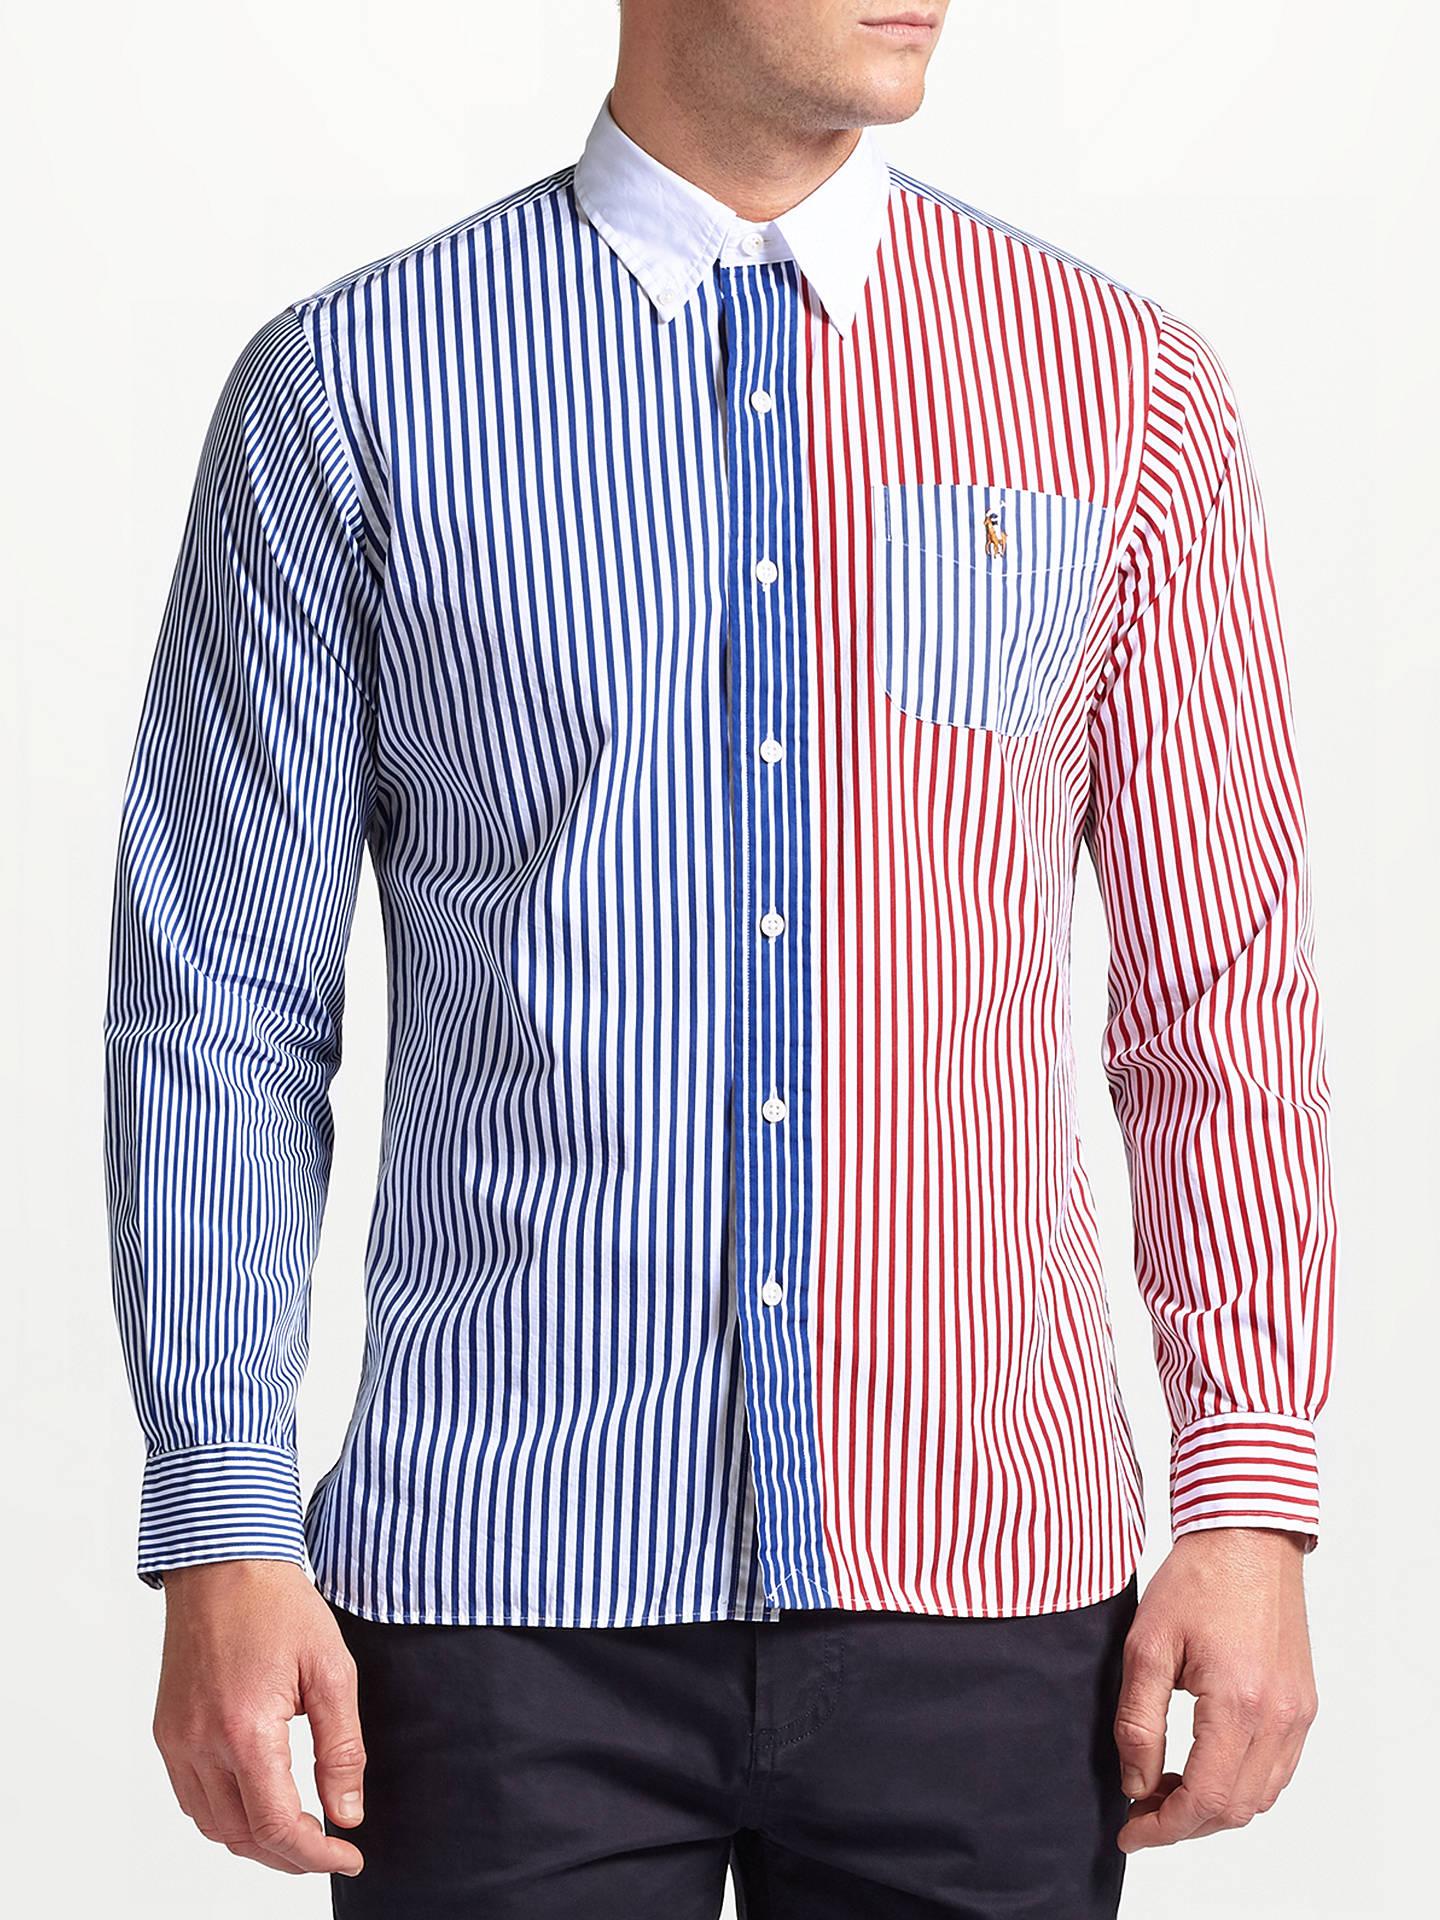 d3f12400e Buy Polo Ralph Lauren Vertical Stripe Sports Shirt, Blue/Red, S Online at  ...